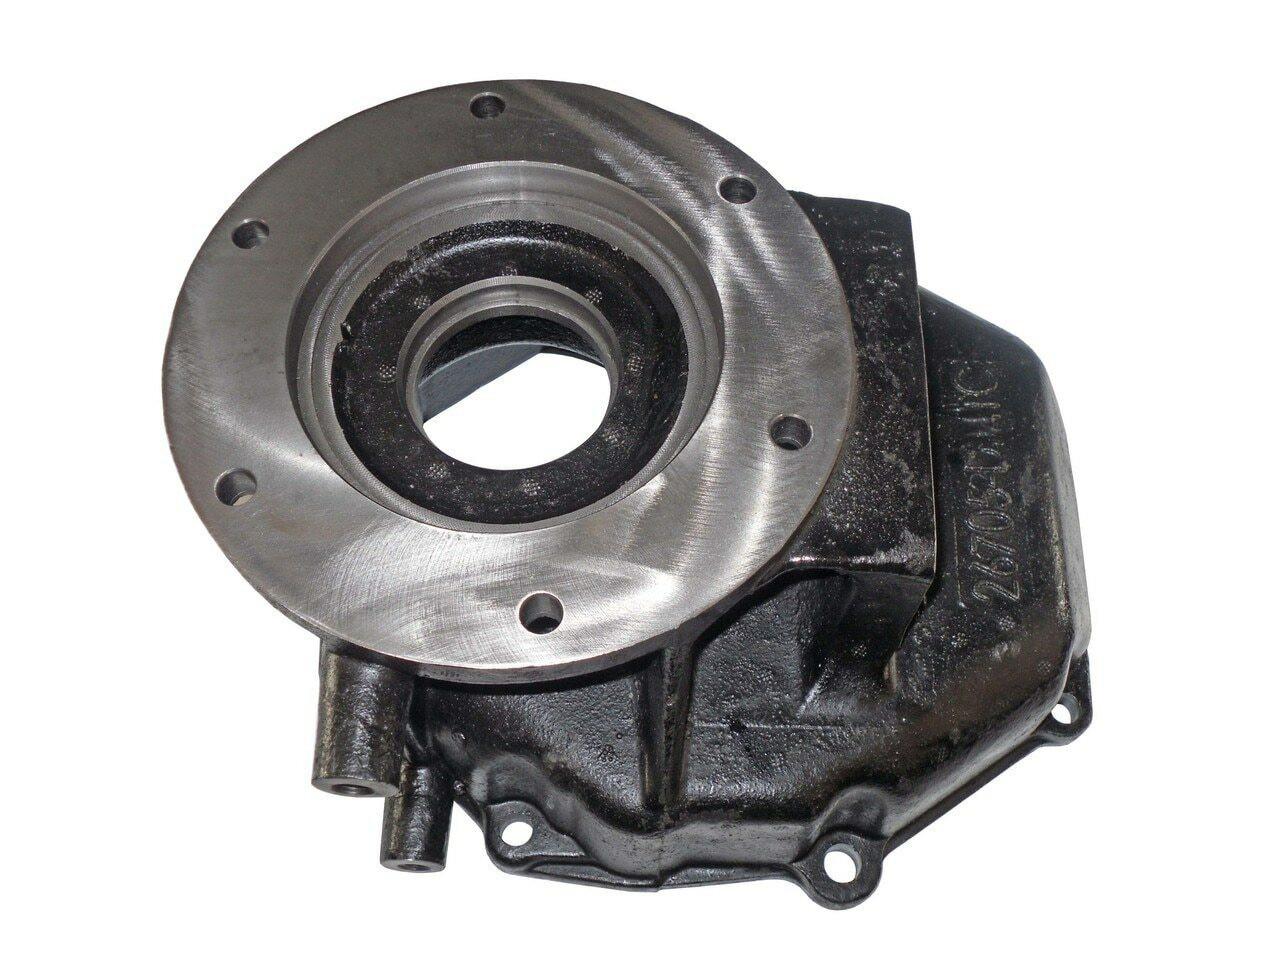 QU10060 Cast Iron NV4500 4x4 Transmission Tailhousing for Dodge ...